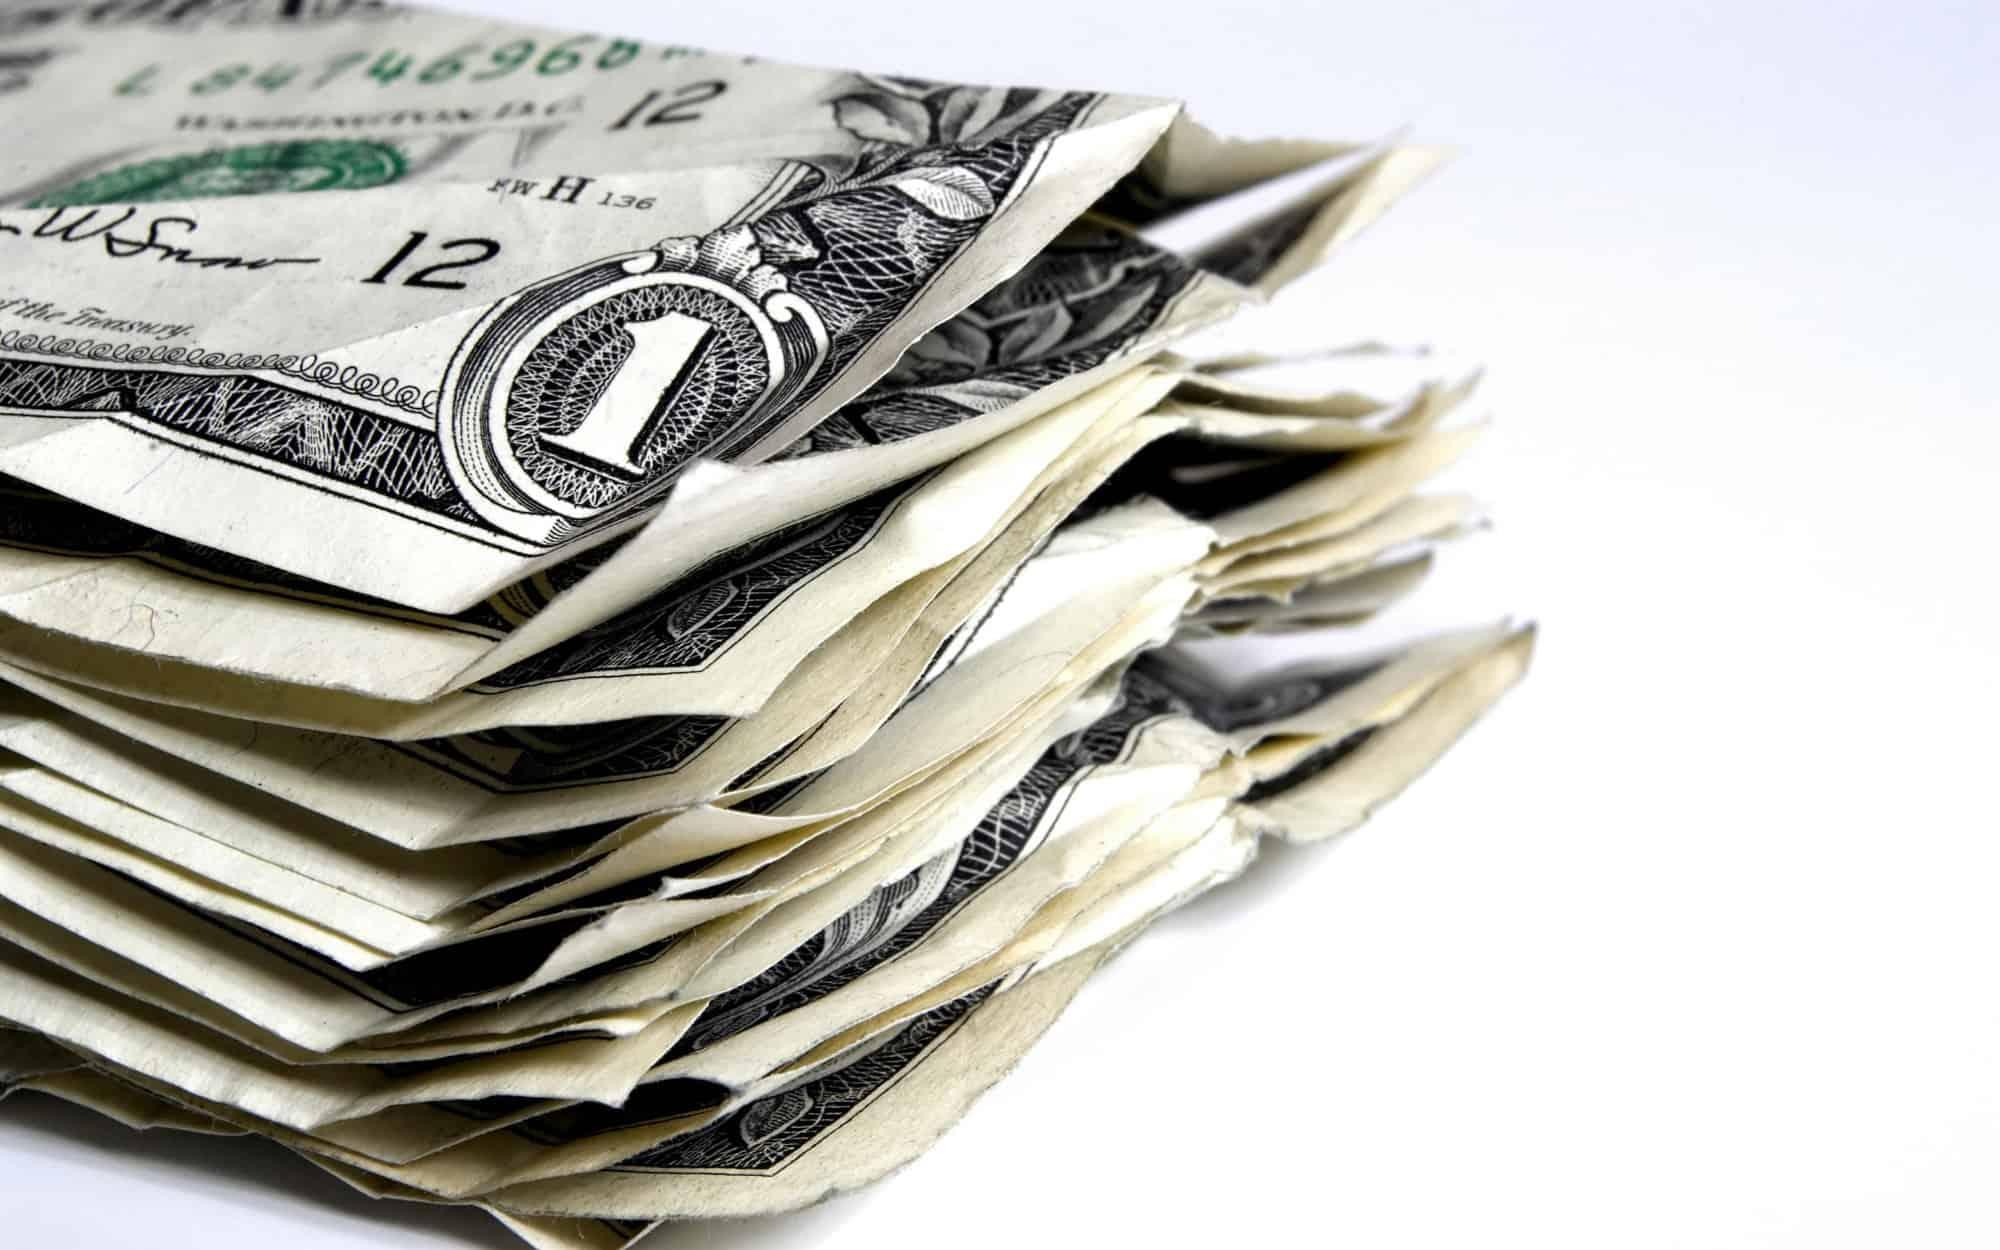 كم يساوي 20 دولار بالريال السعودي موسوعة